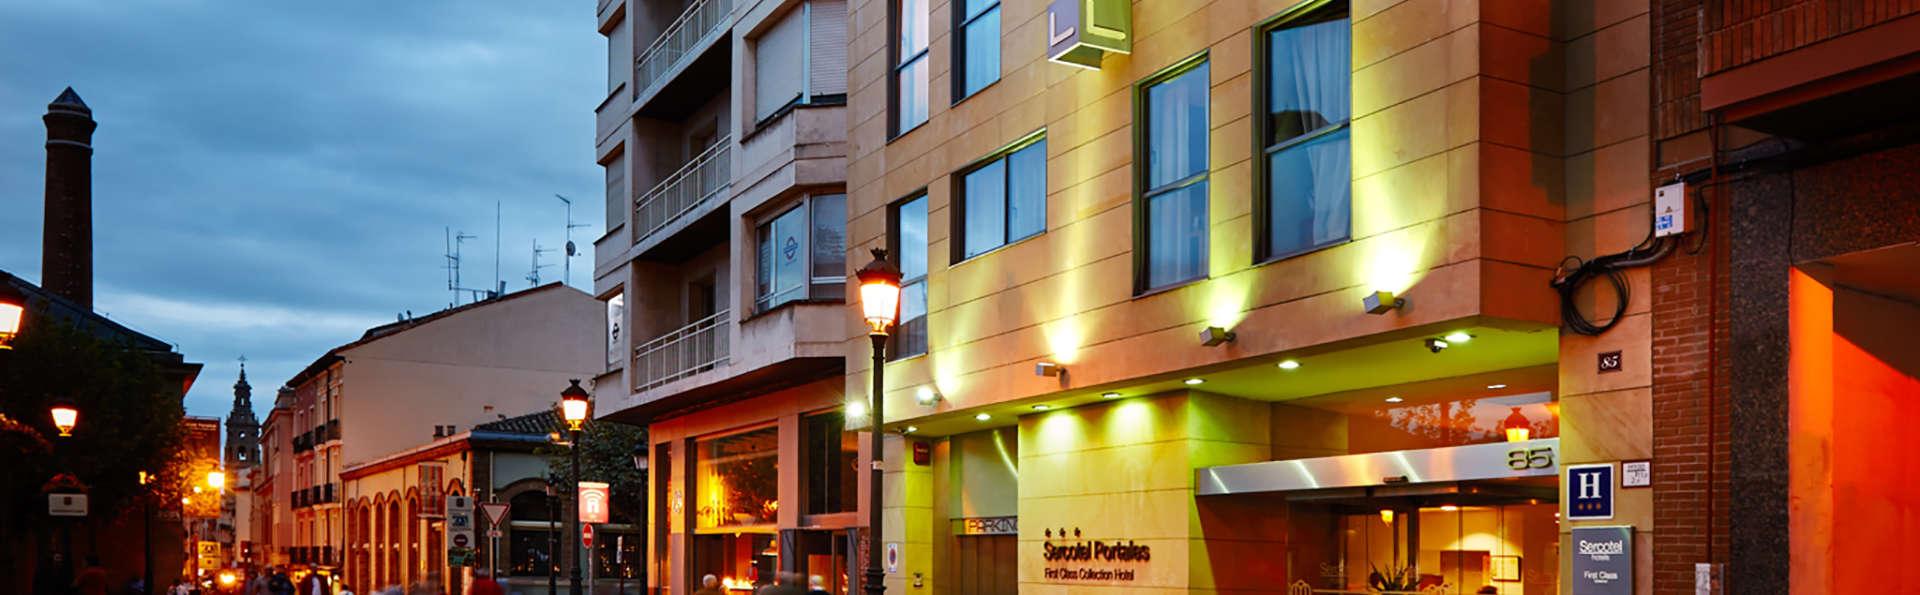 Hotel Sercotel Portales - Edit_Front.jpg